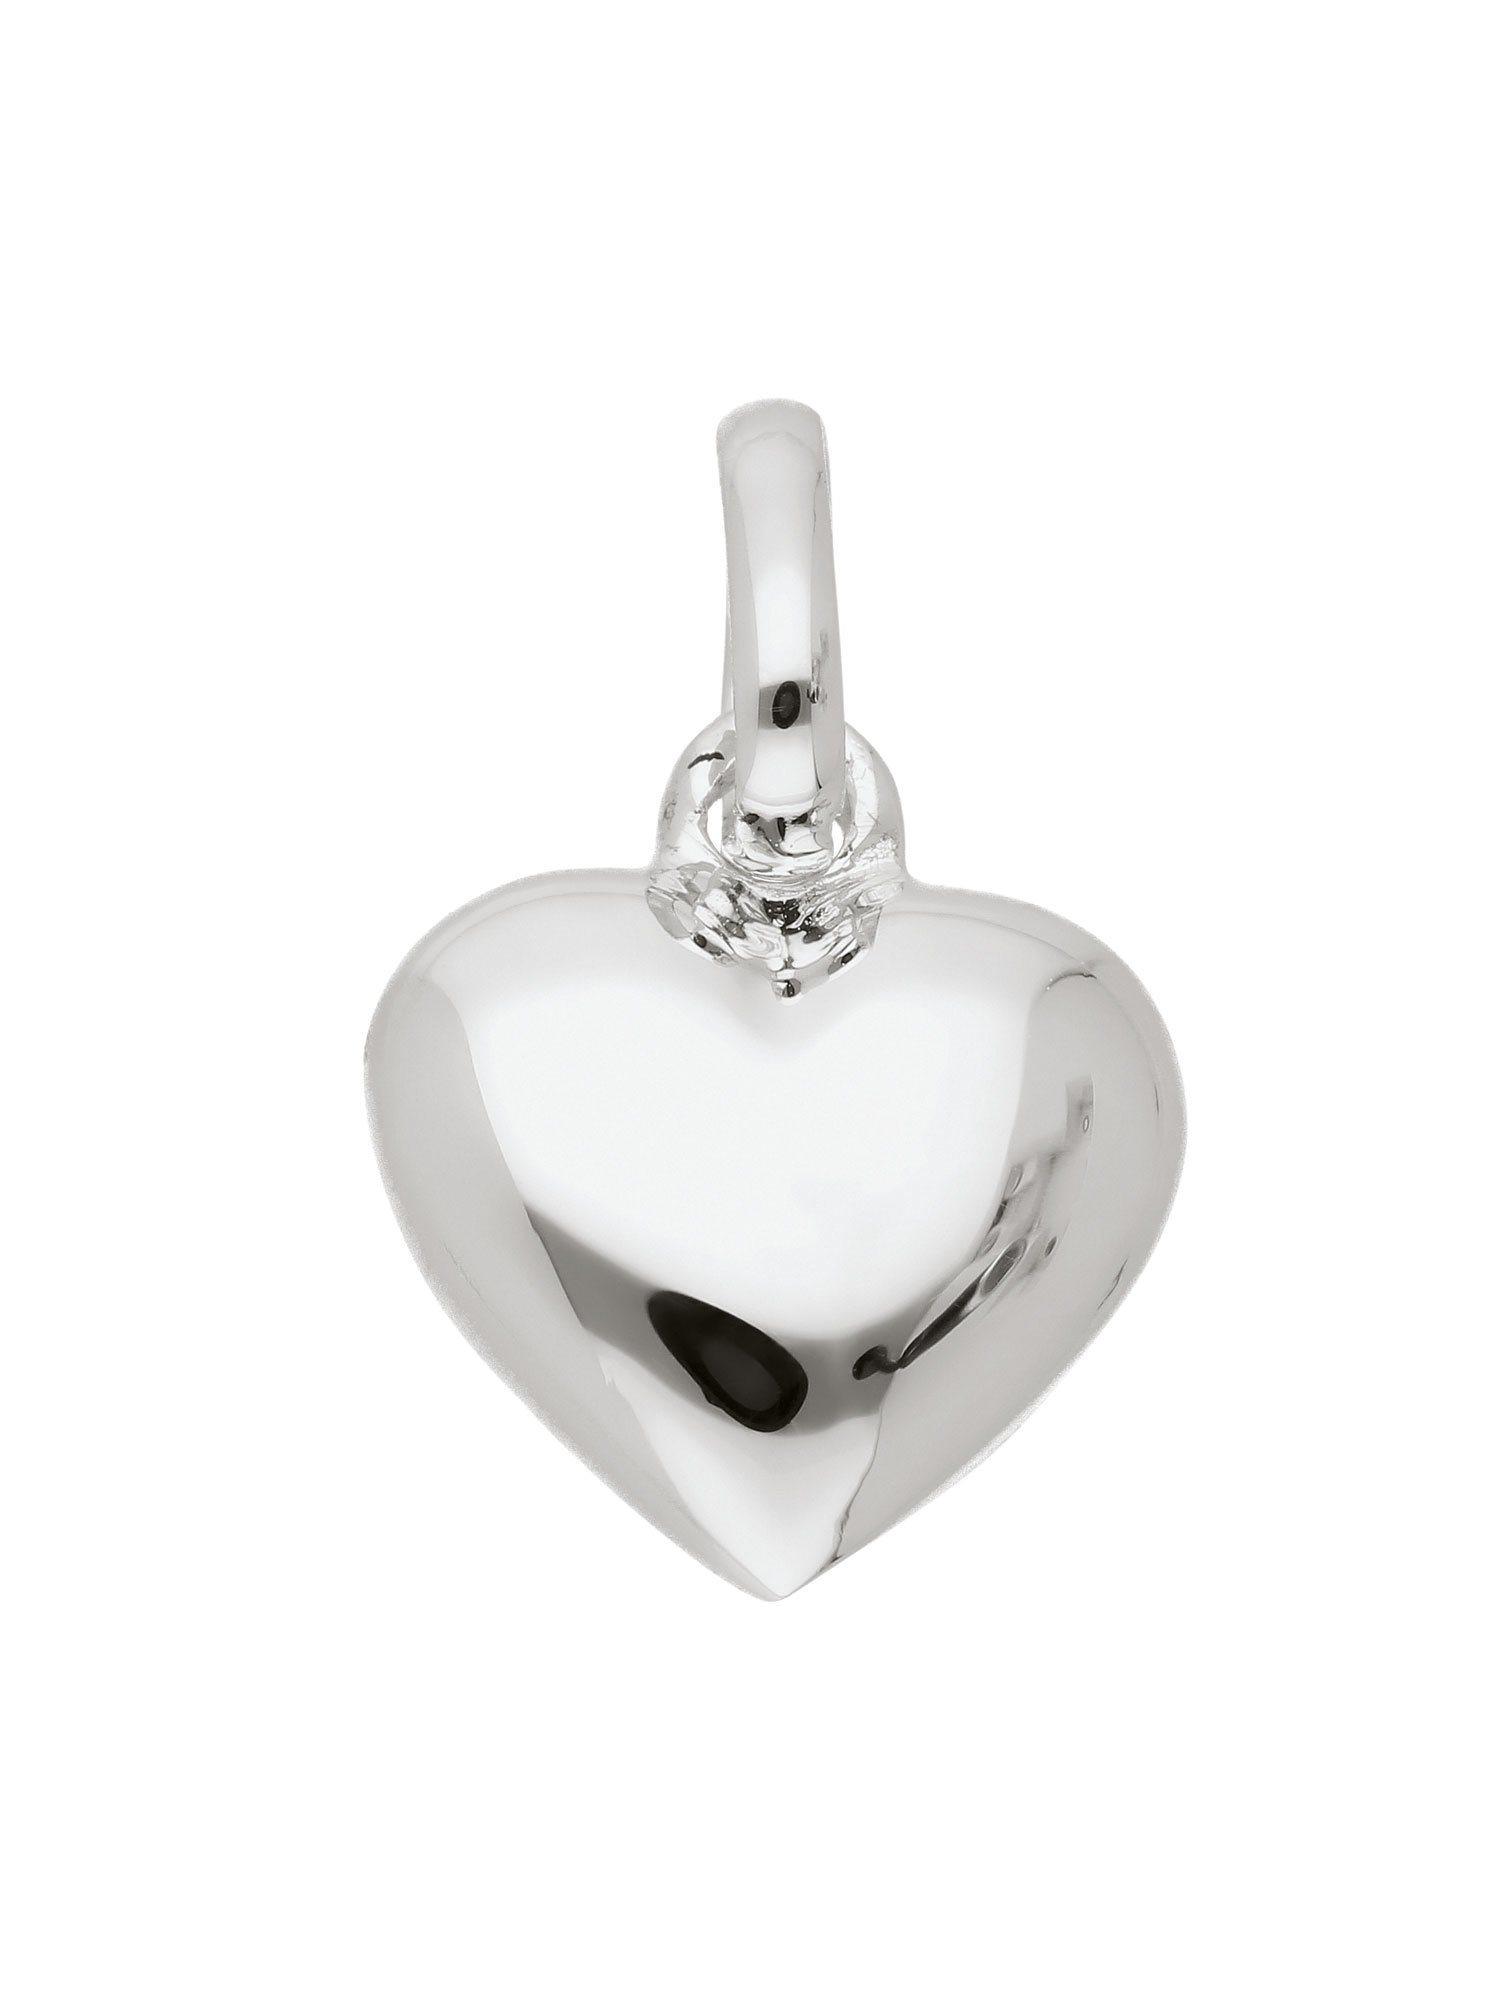 Adelia´s Kettenanhänger »Silber Anhänger« Herz 925 Sterling Silber   Schmuck > Halsketten > Ketten ohne Anhänger   Adelia´s